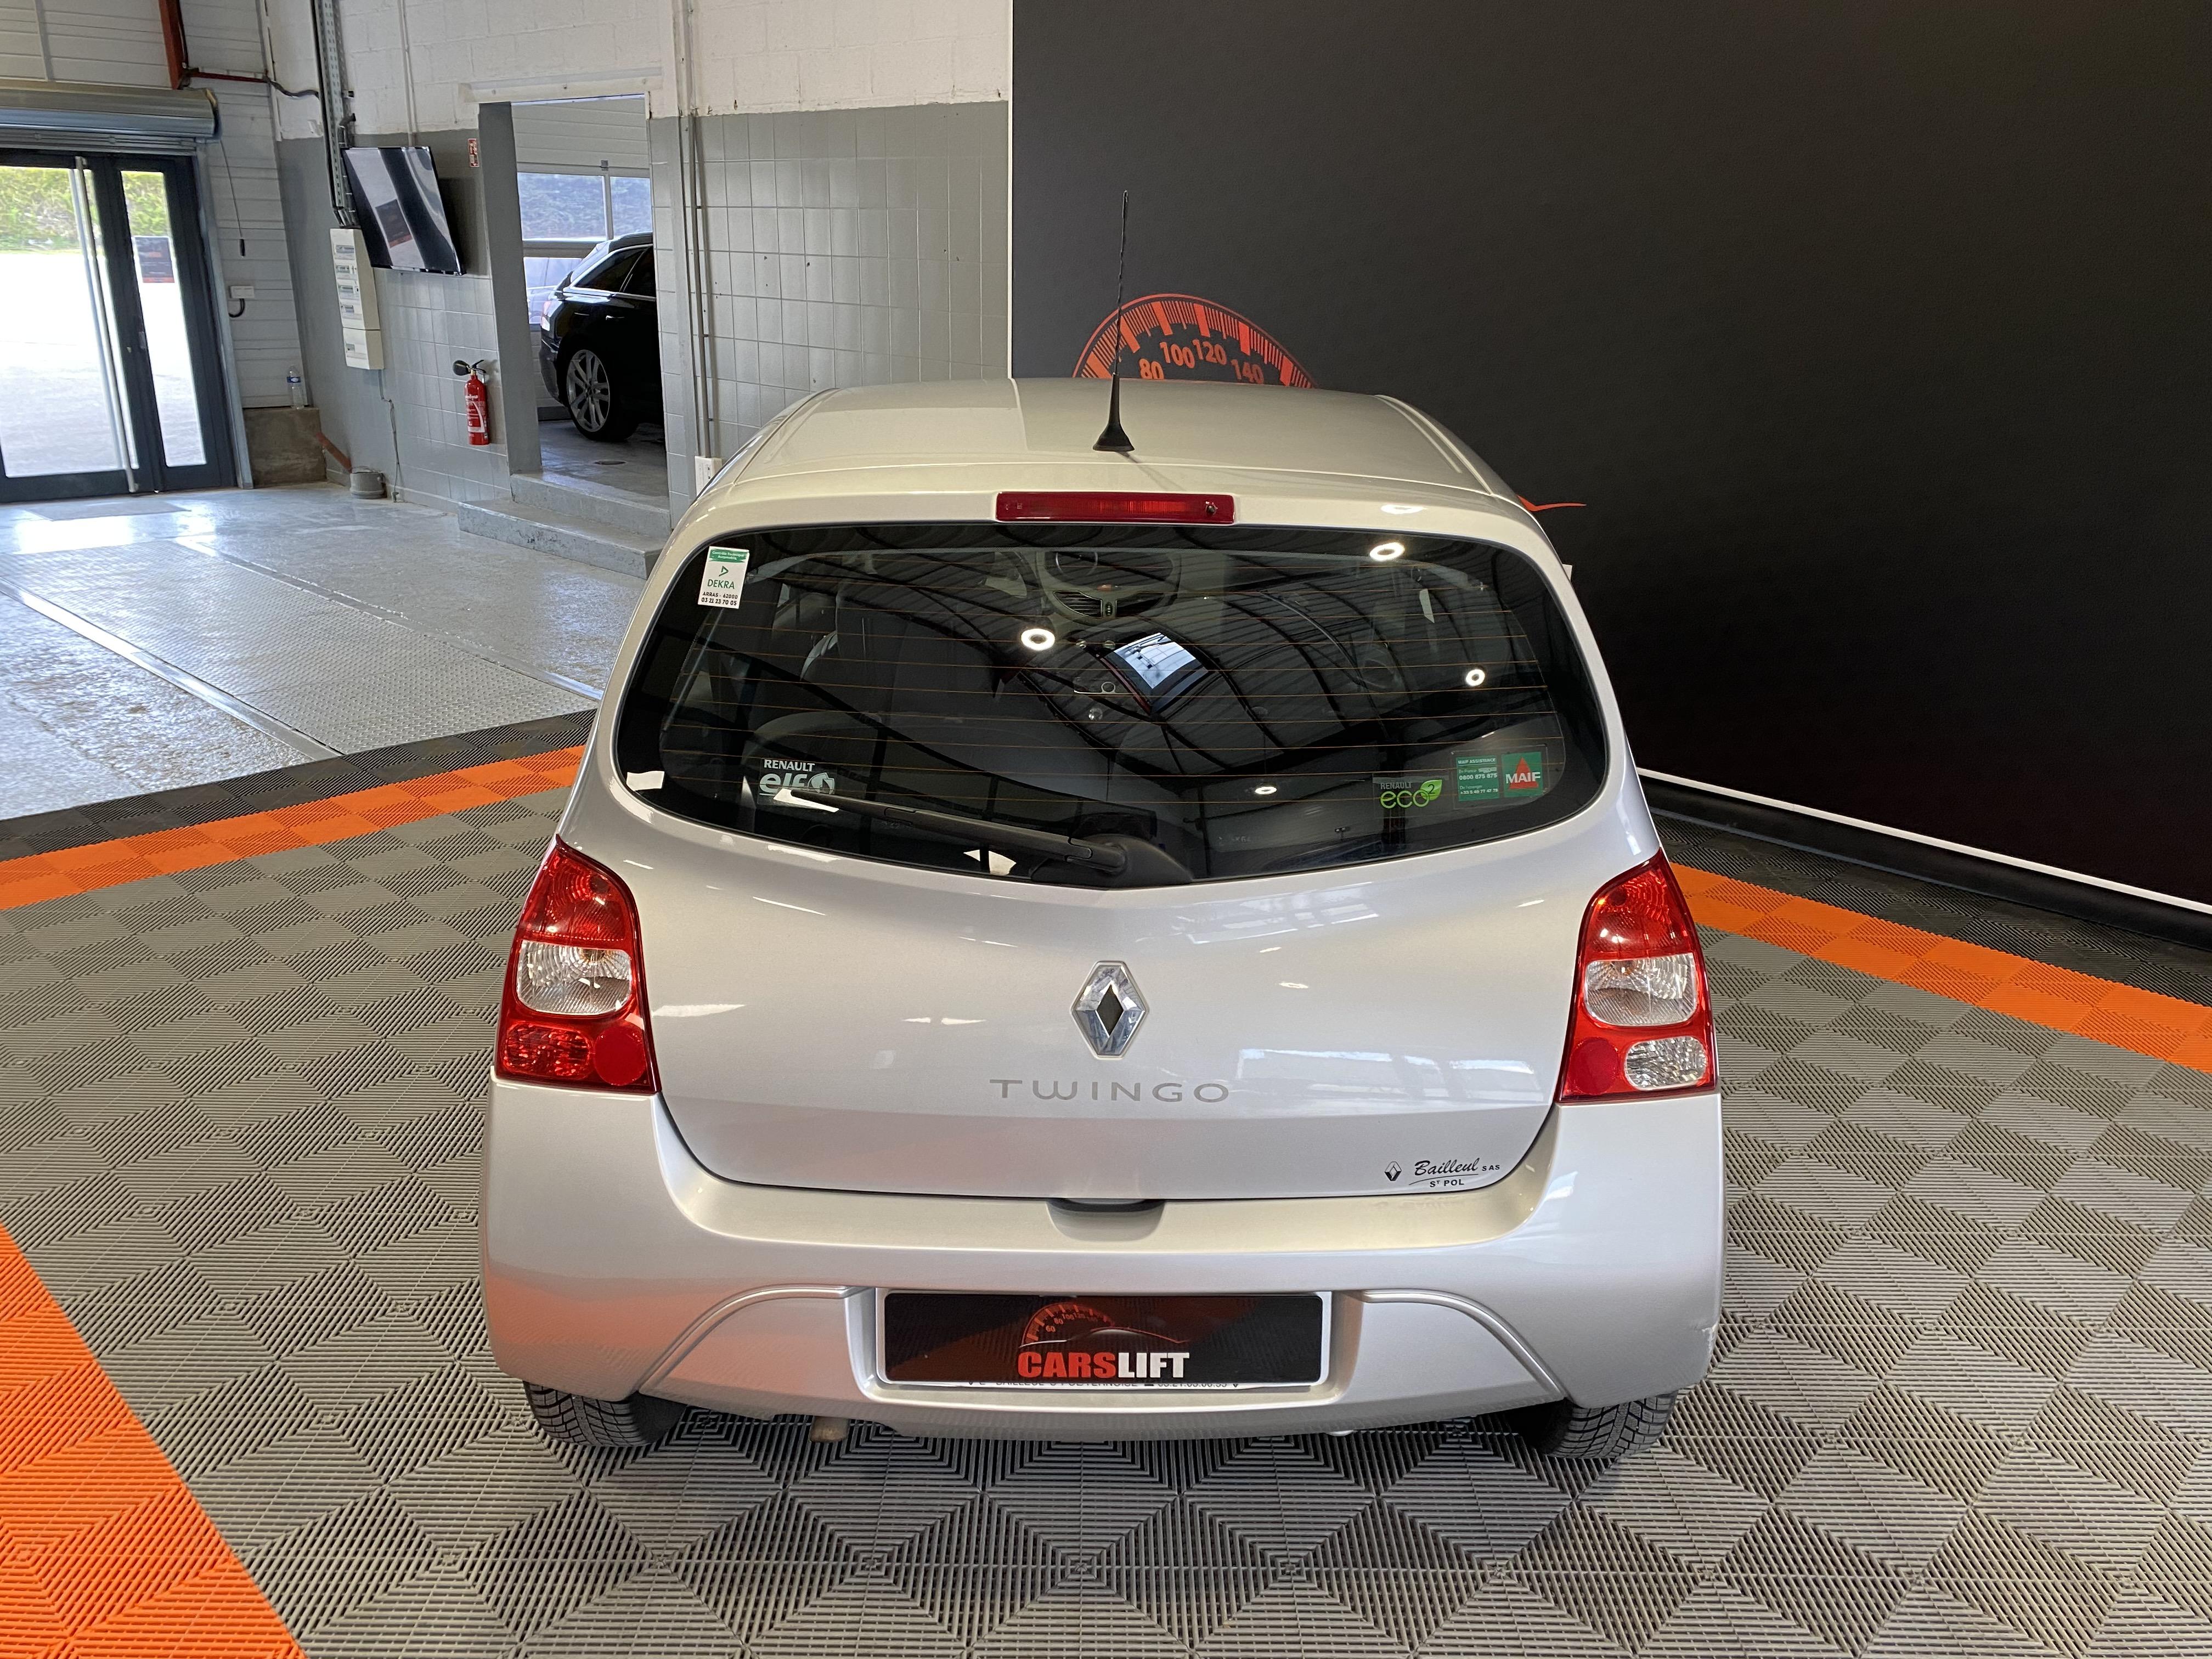 photo_Renault Twingo II 1.2i 75 CH - GARANTIE 6 MOIS,